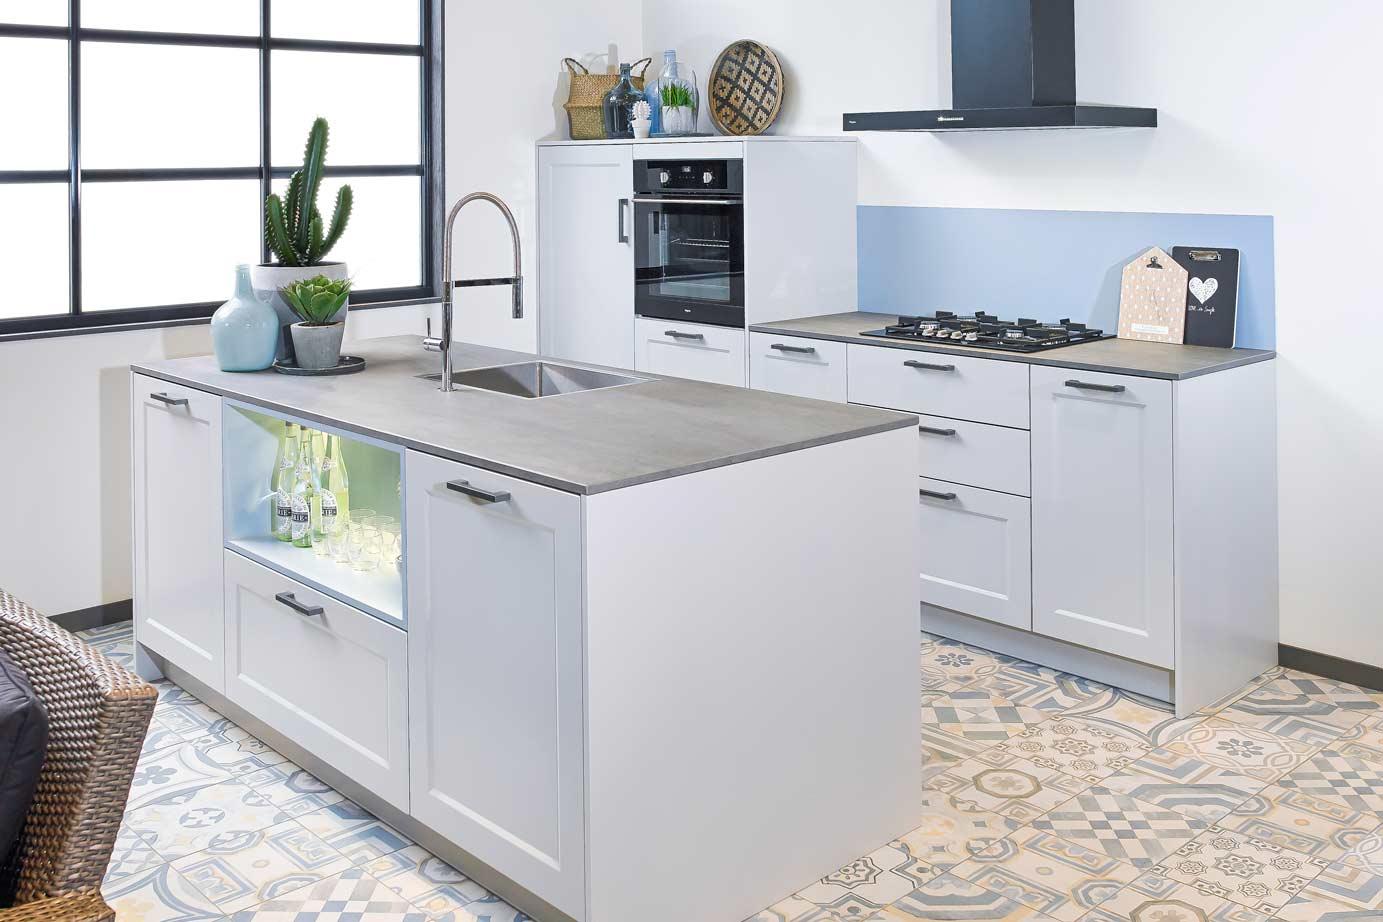 Complete Keuken Goedkoop : Honderden complete keukens online met apparatuur db keukens